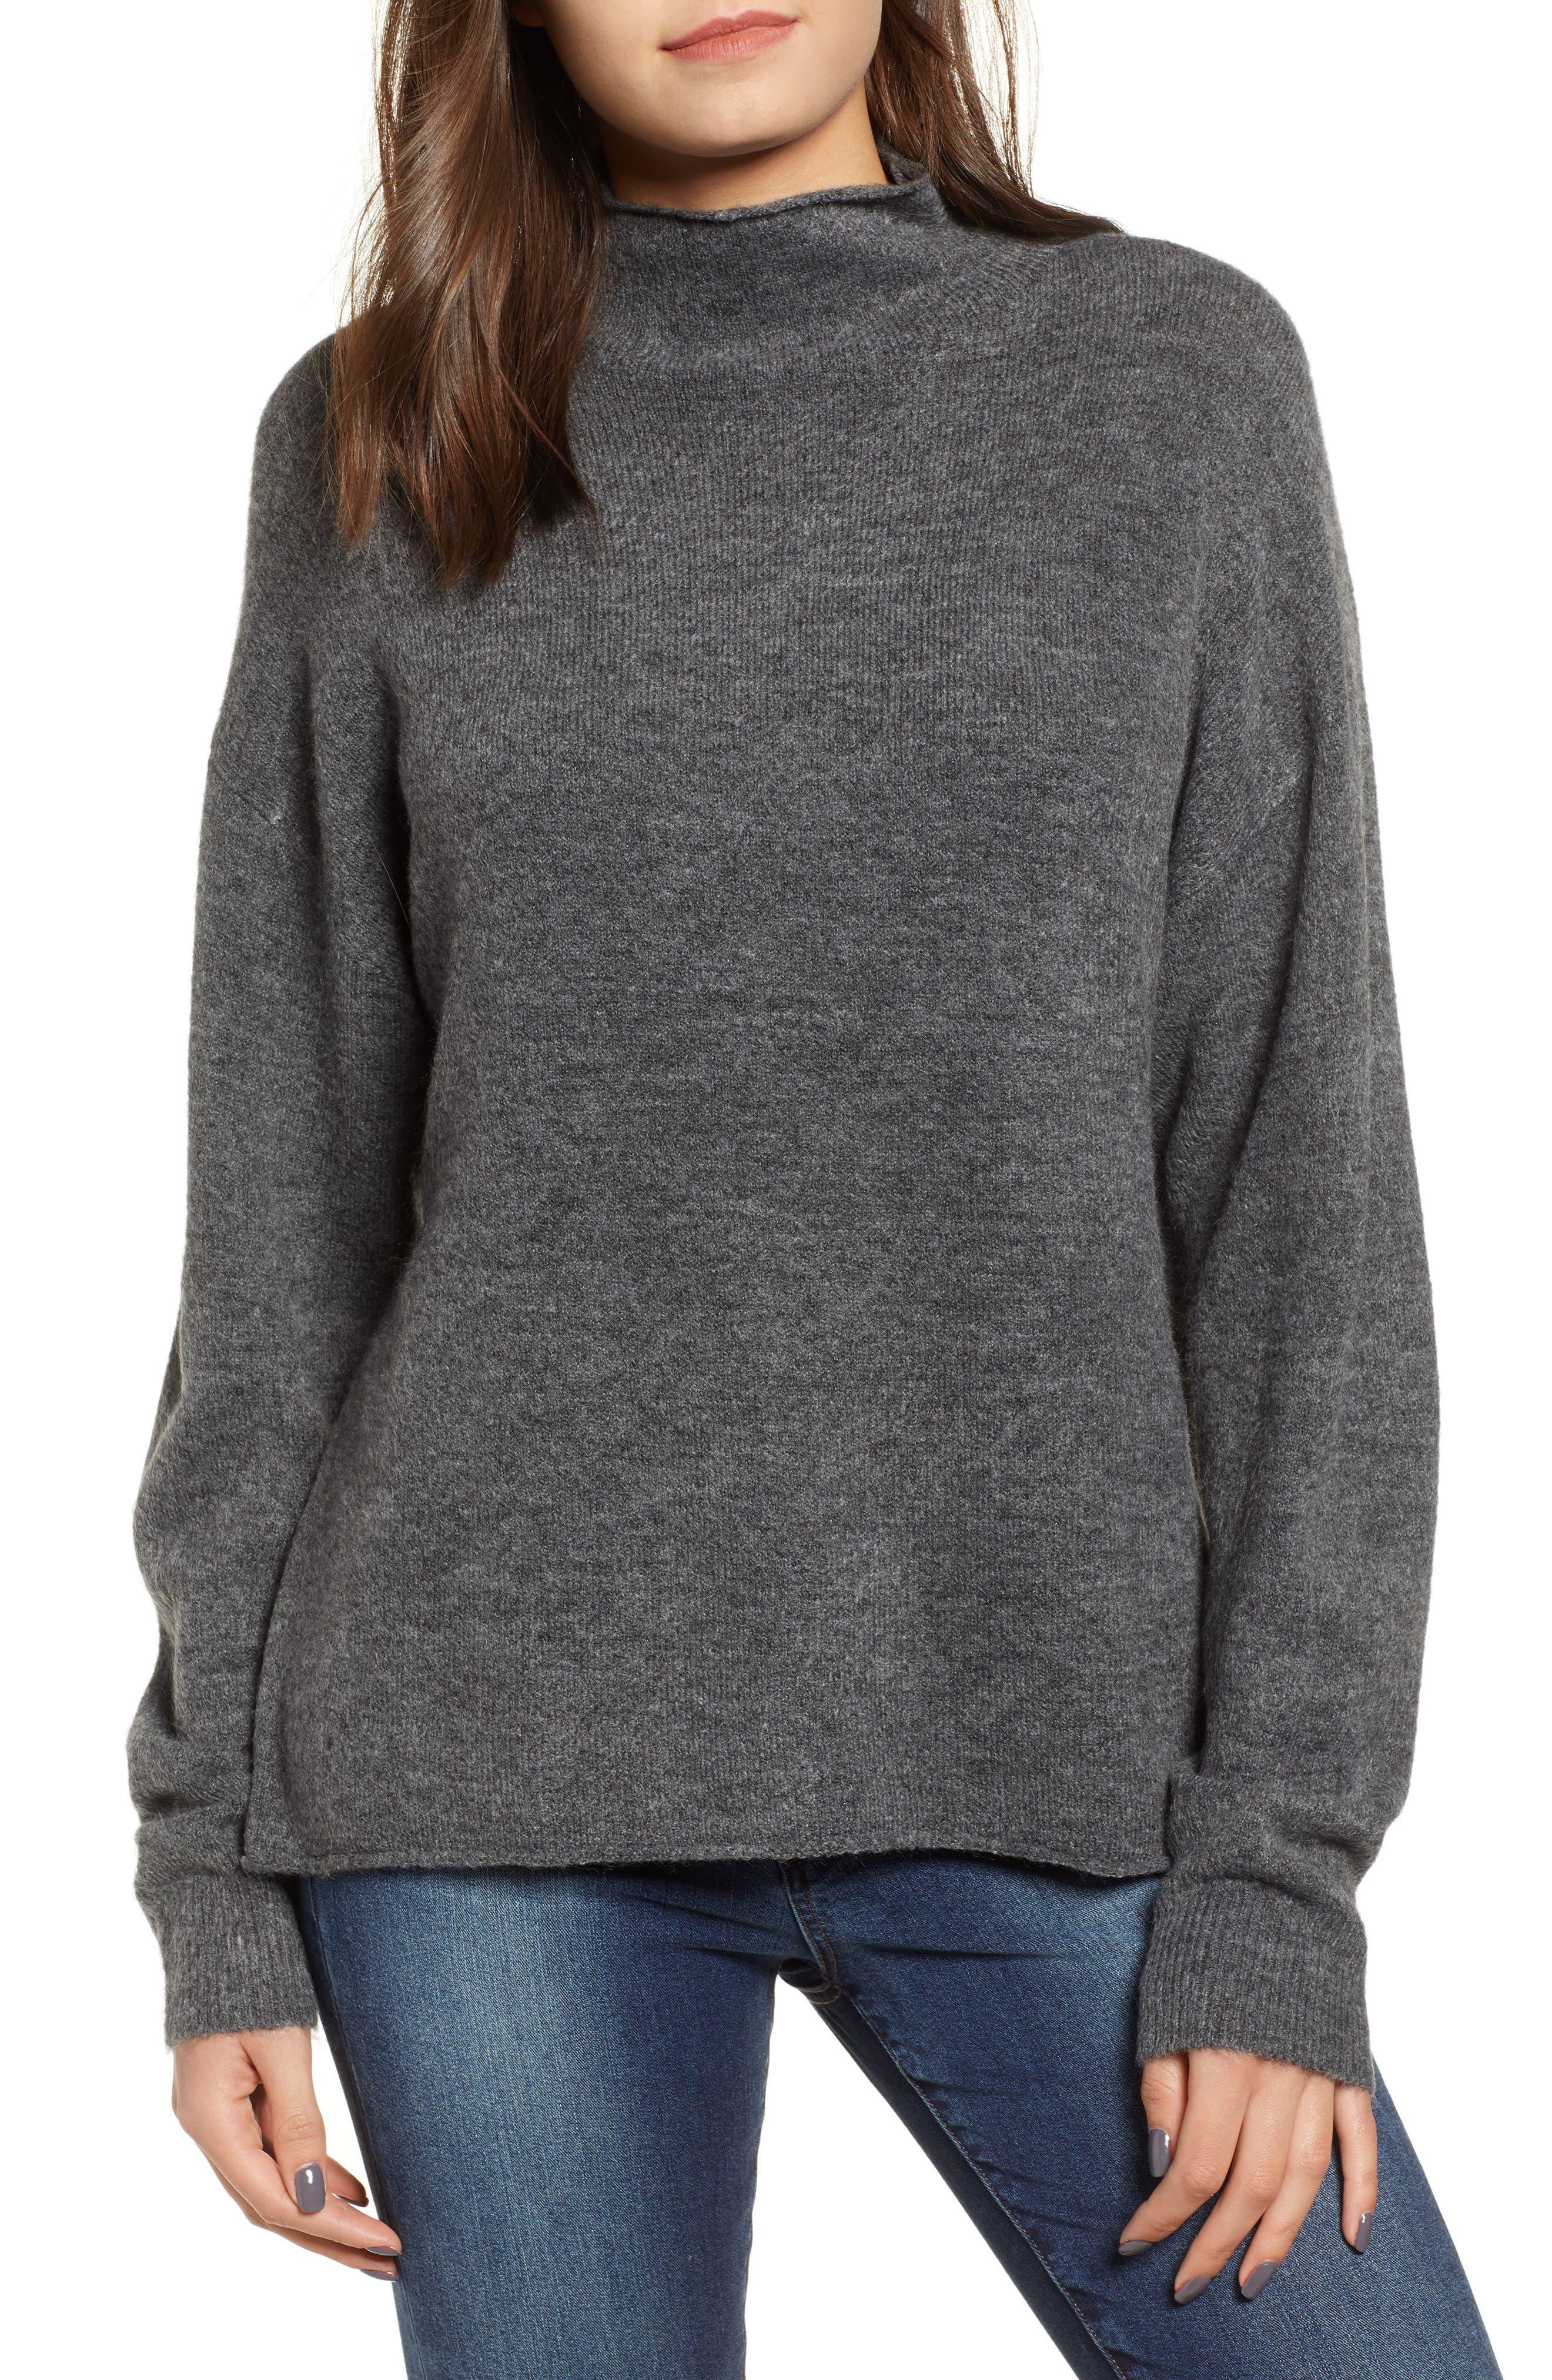 Cozy Mock Neck Sweater,                         Main,                         color, GREY MEDIUM CHARCOAL HEATHER